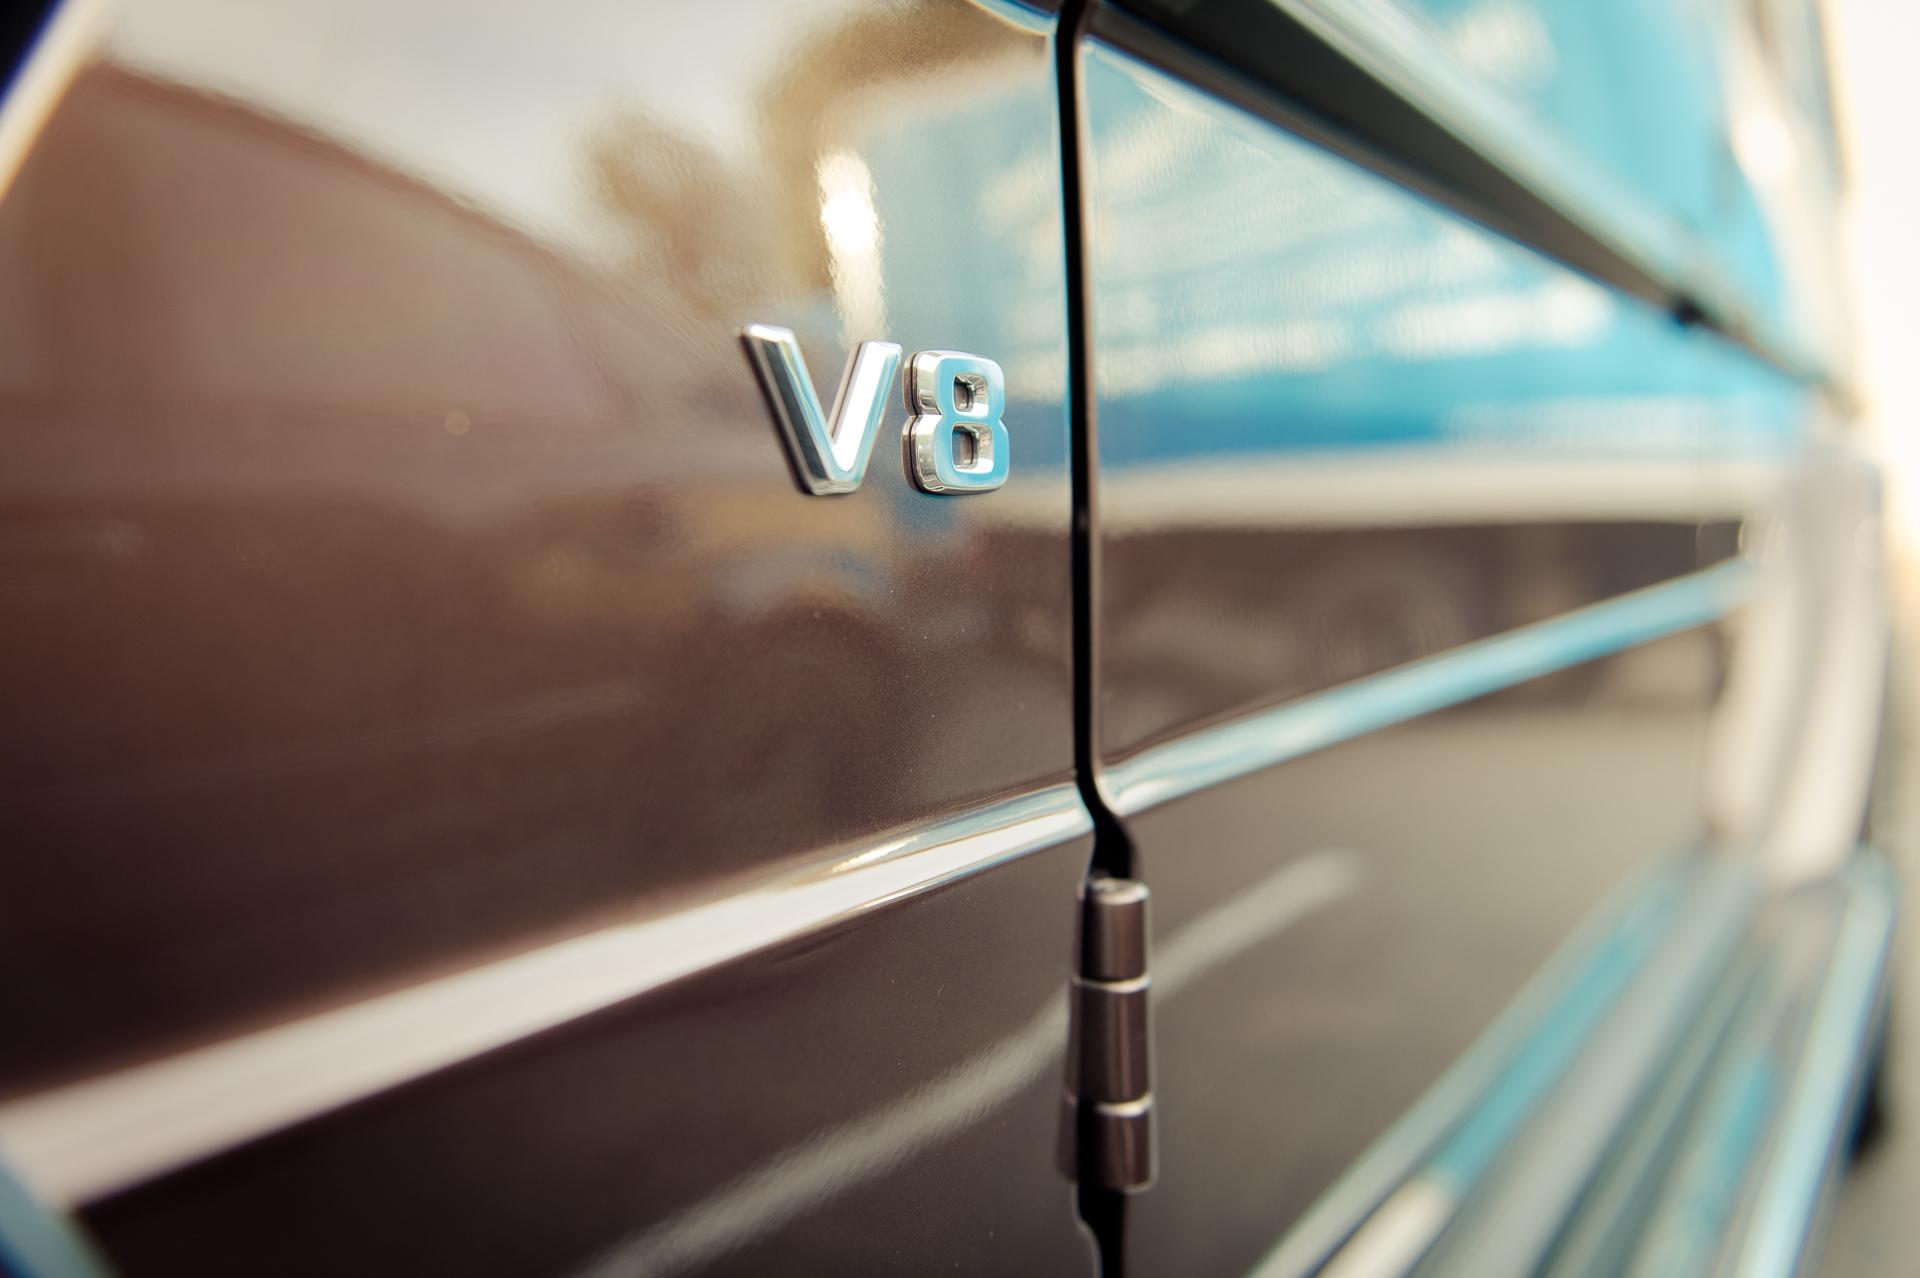 2014-Mercedes-Benz-G500-G550-braun-Kalifornien-mbrt14-27